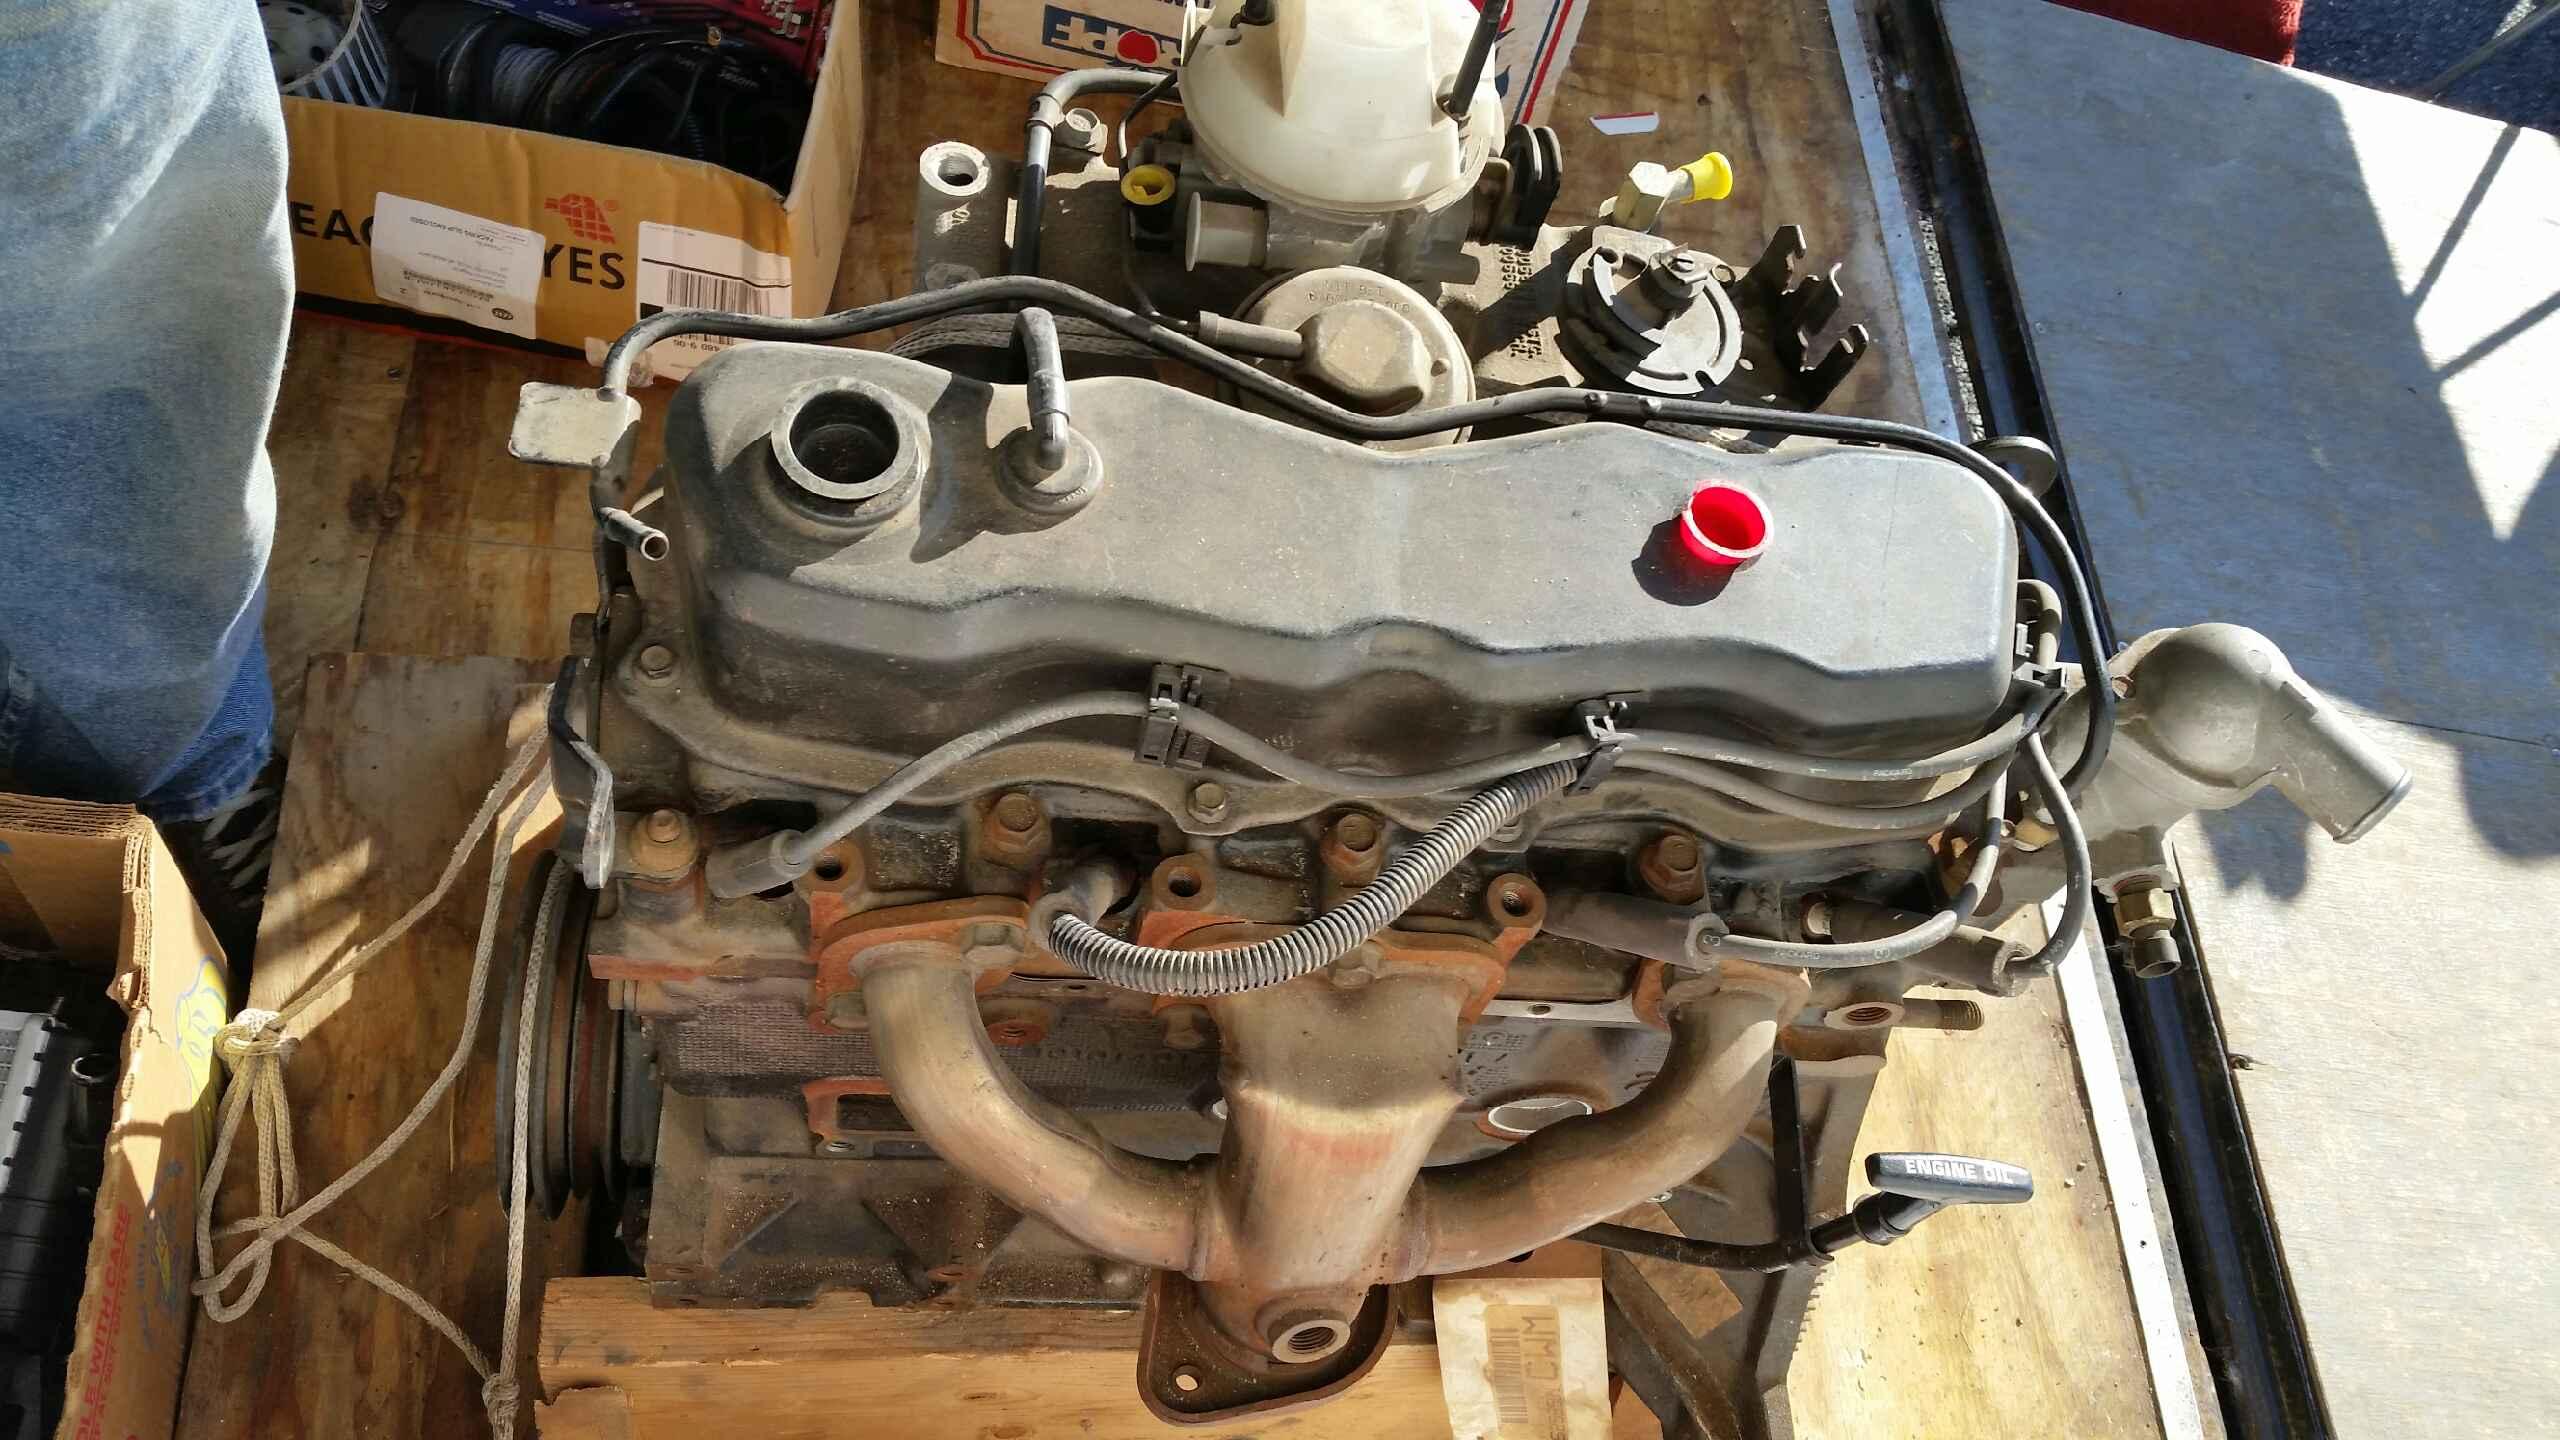 Iron Duke Crate Engine Diagram For Sale At Hershey Til Thursday 2560x1440